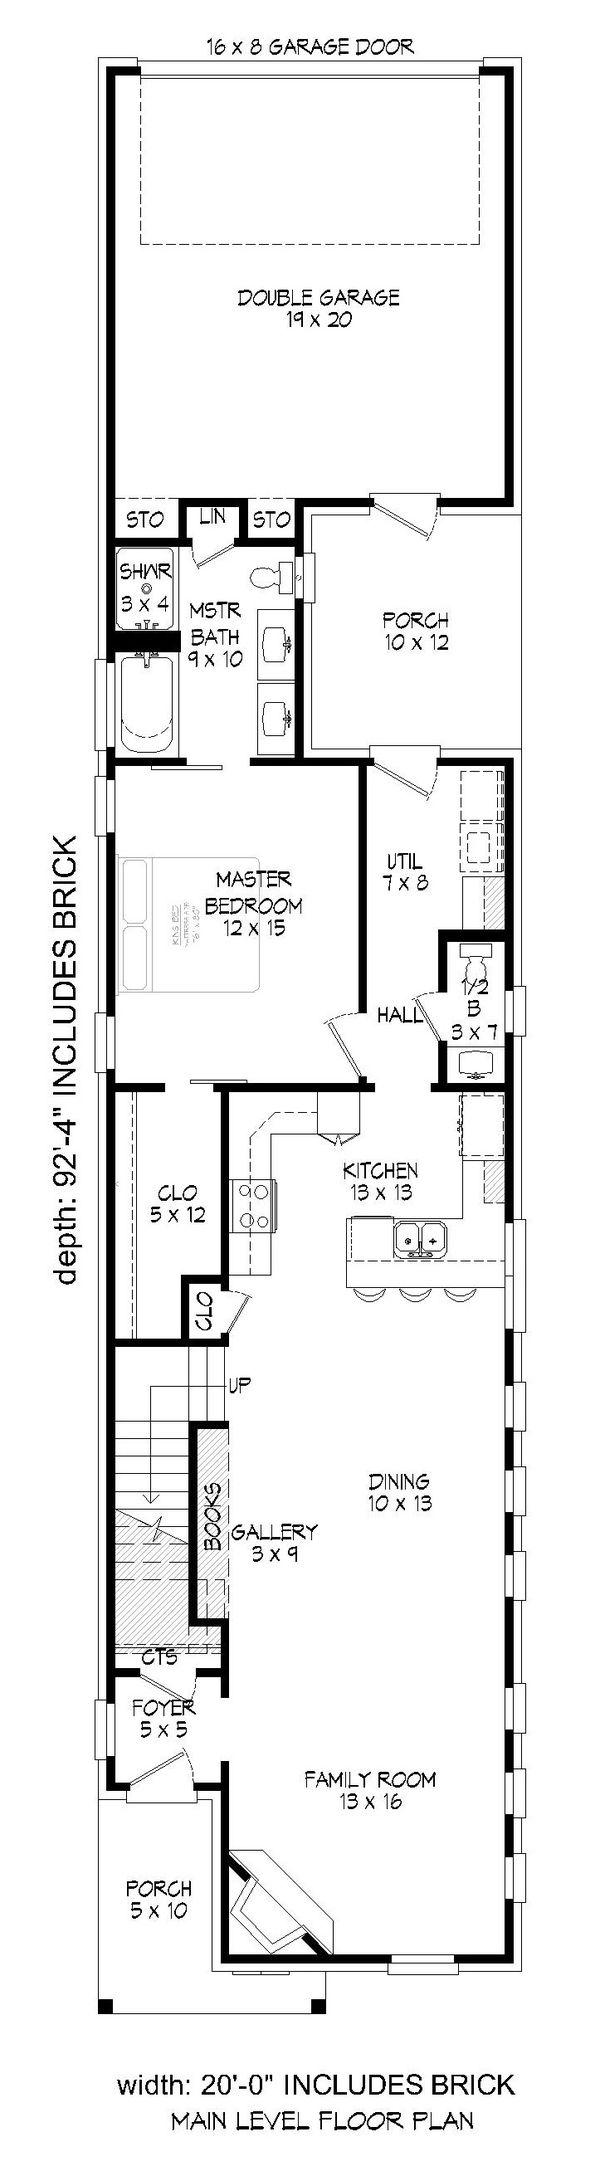 Dream House Plan - Traditional Floor Plan - Main Floor Plan #932-399